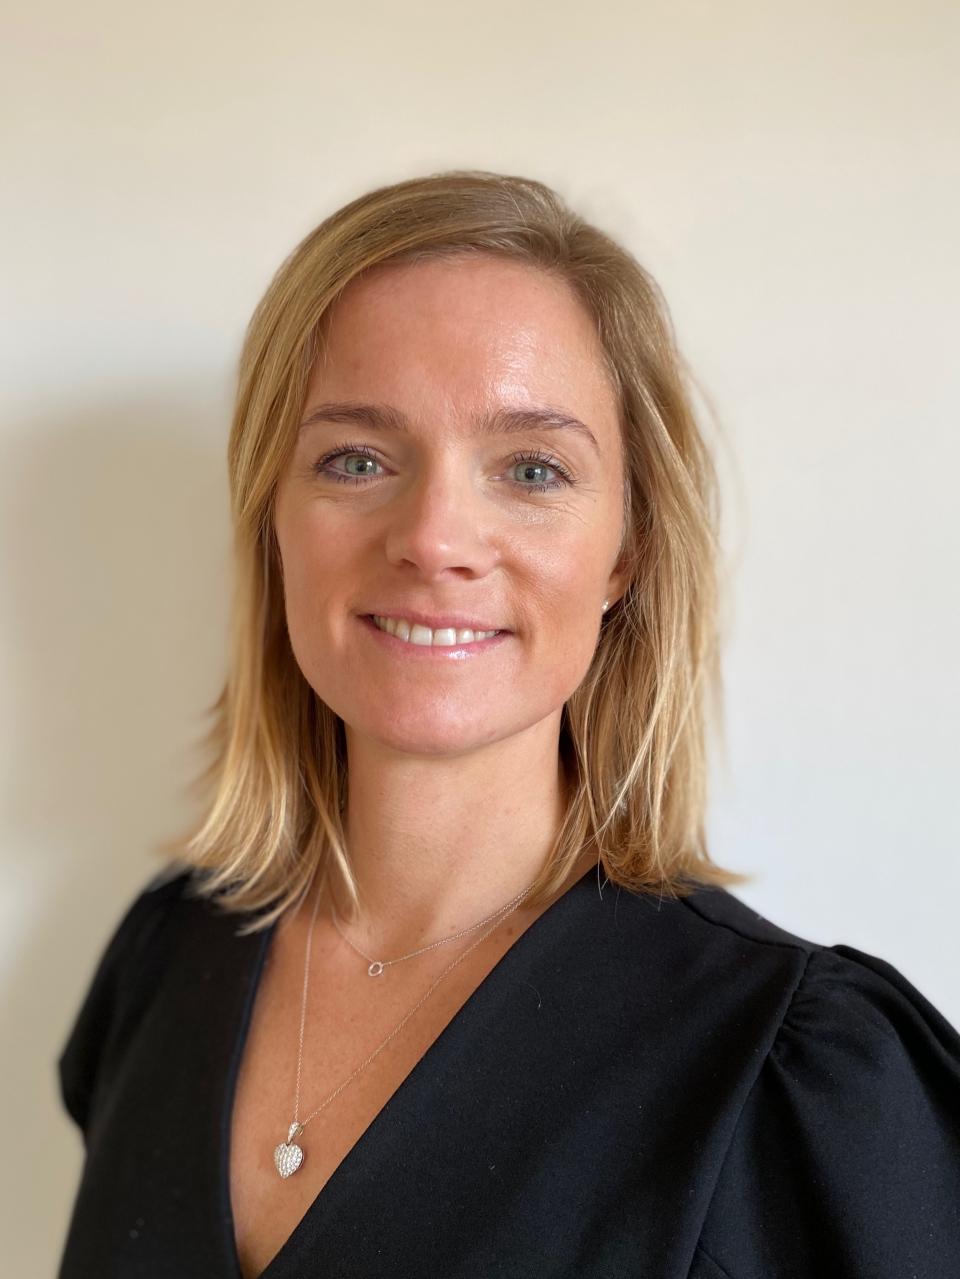 Anna Qviberg Engebretsen